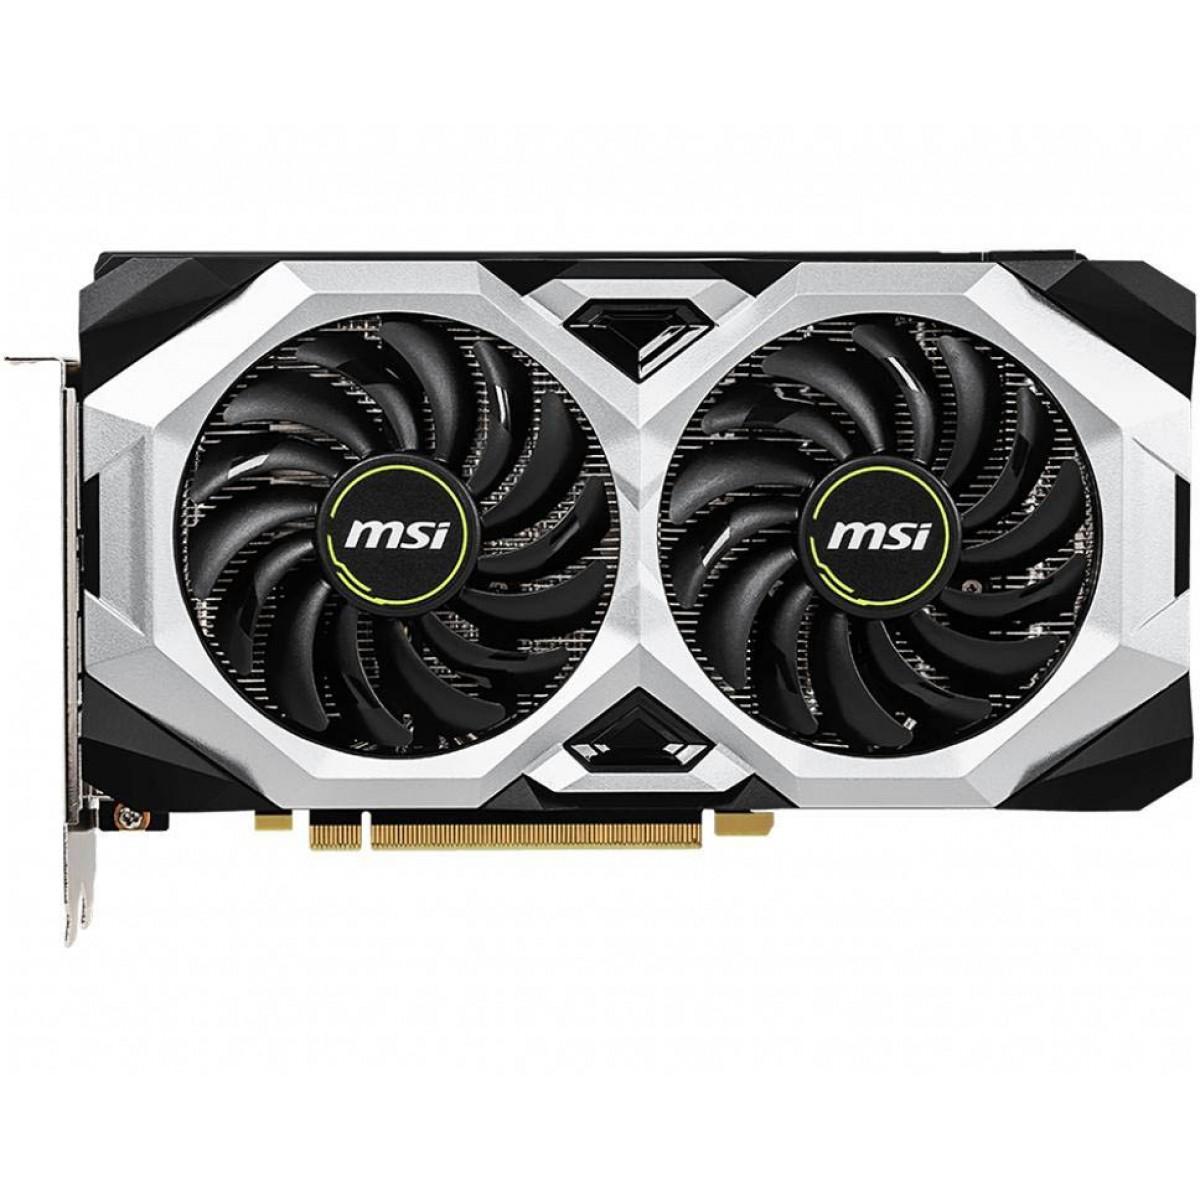 Placa de Video MSI, GeForce, RTX 2060 Super Ventus OC, Dual, 8GB, GDDR6, 256Bit, 912-V375-253